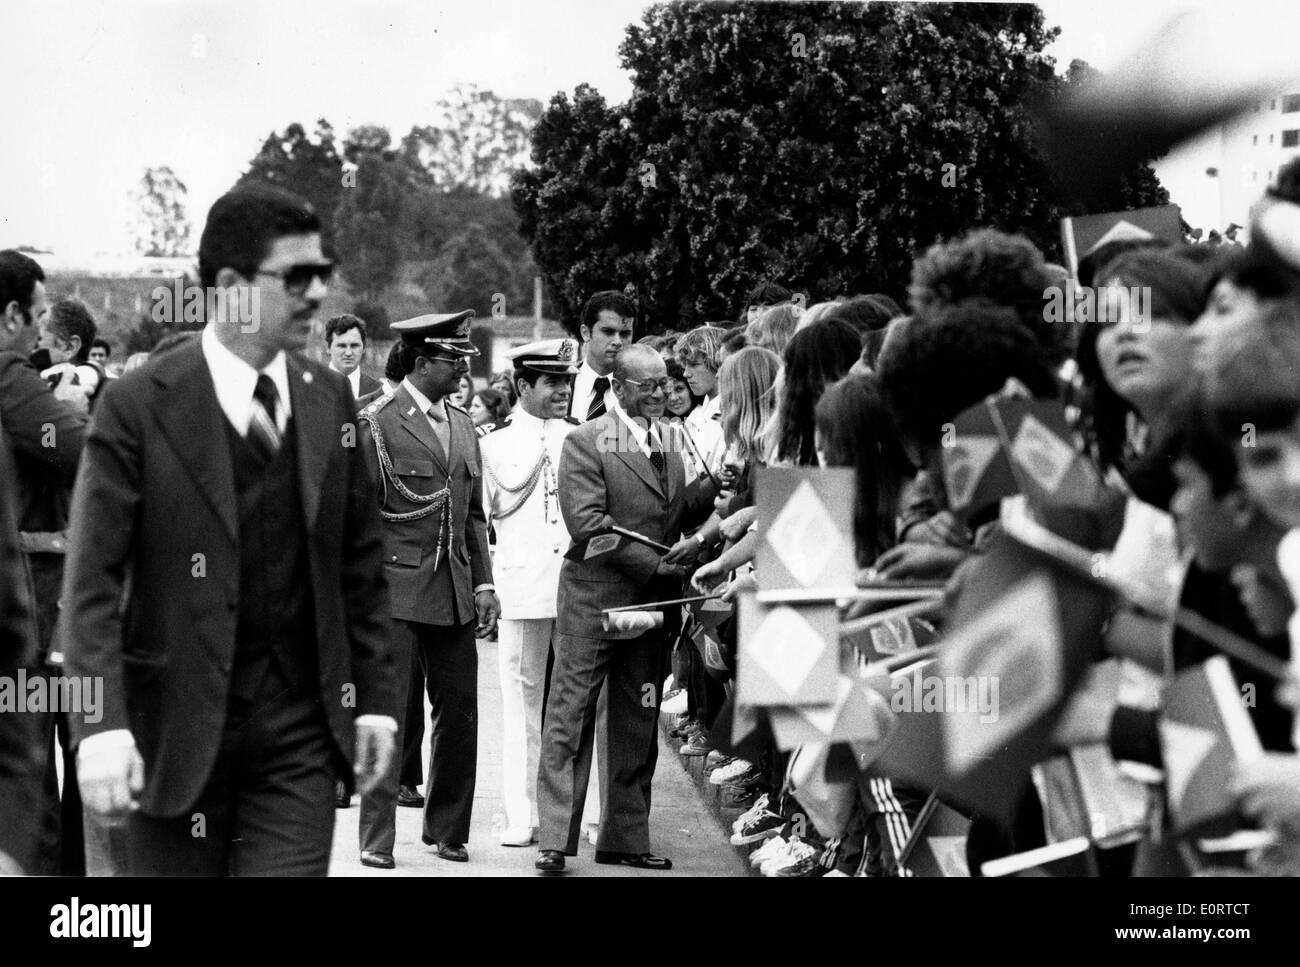 President Joao Figueiredo greets civilians - Stock Image